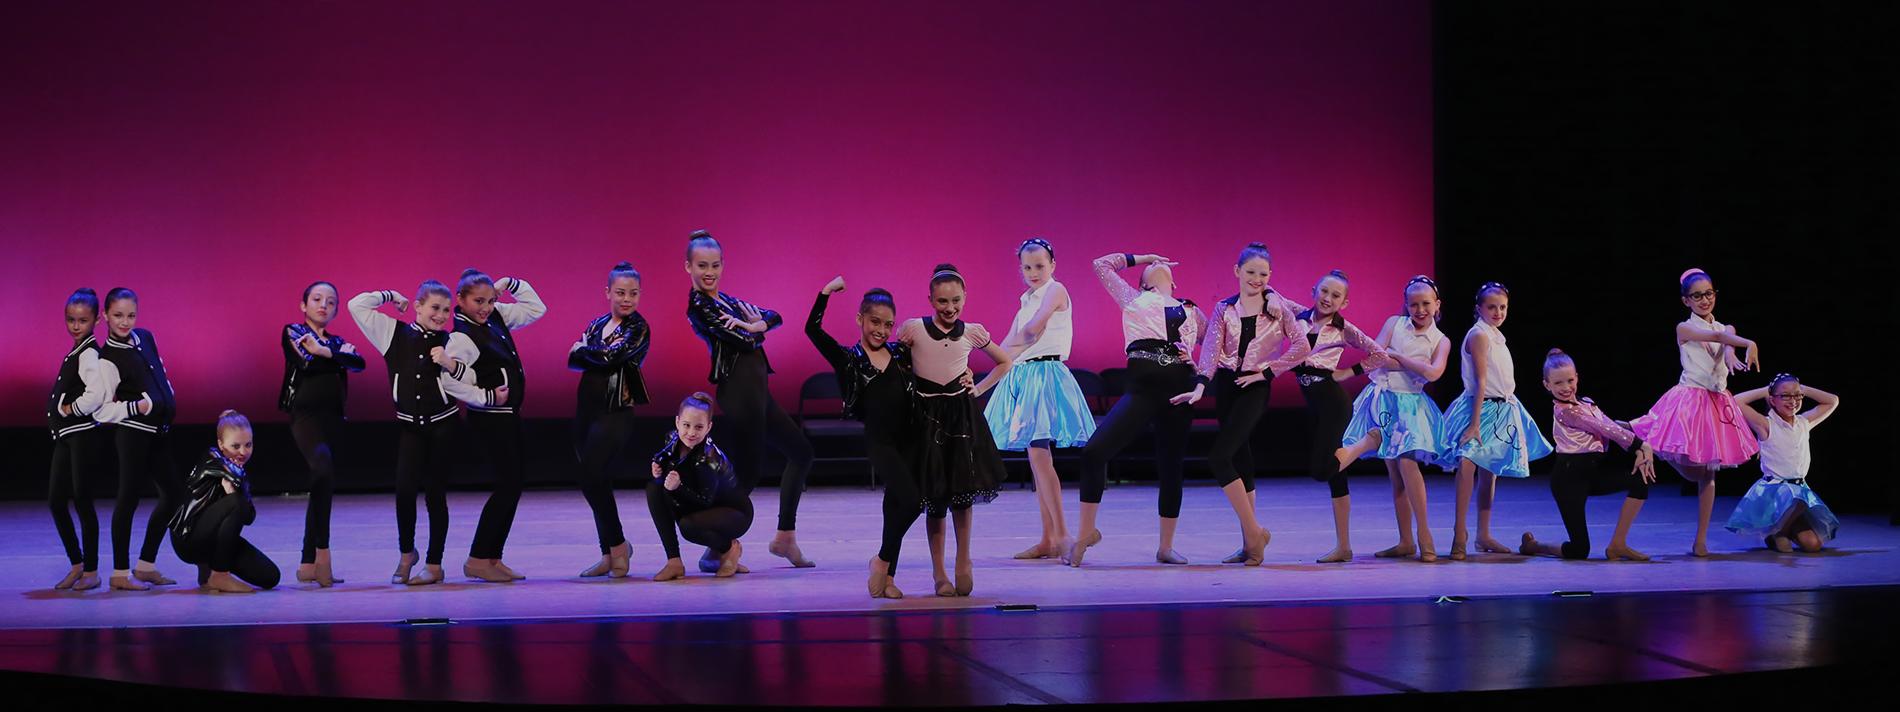 meg segreto's dance studio performance south florida, broward county, plantation, fort lauderdale